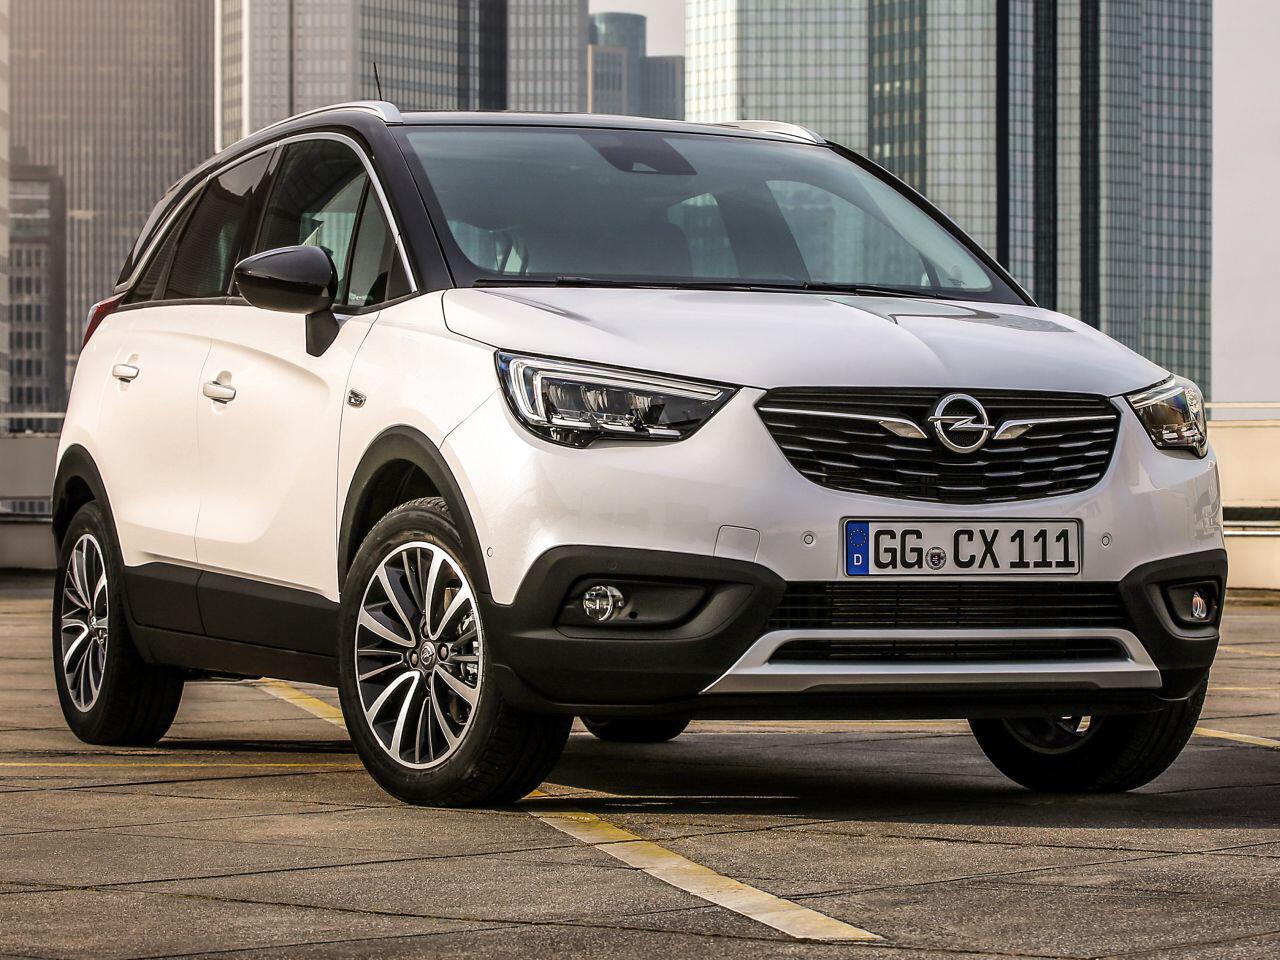 Bild zu Platz 14: Opel Crossland X